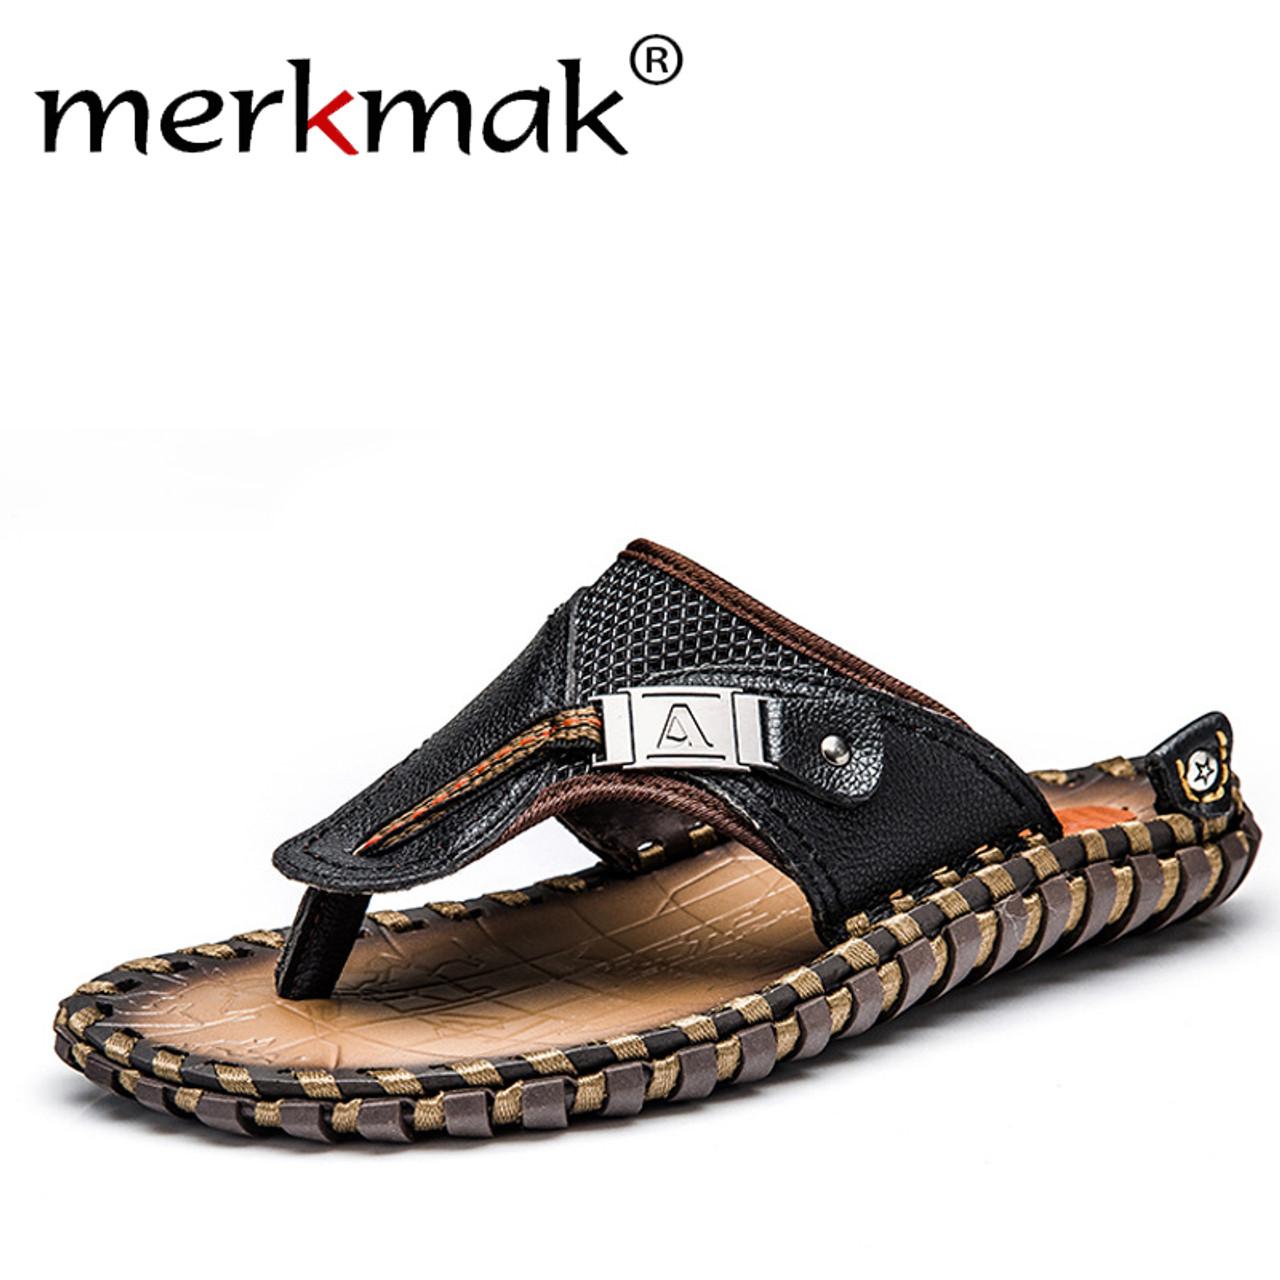 896e8ba574bba Merkmak Luxury Brand 2018 New Men s Flip Flops Genuine Leather Slippers  Summer Fashion Beach Sandals Shoes ...